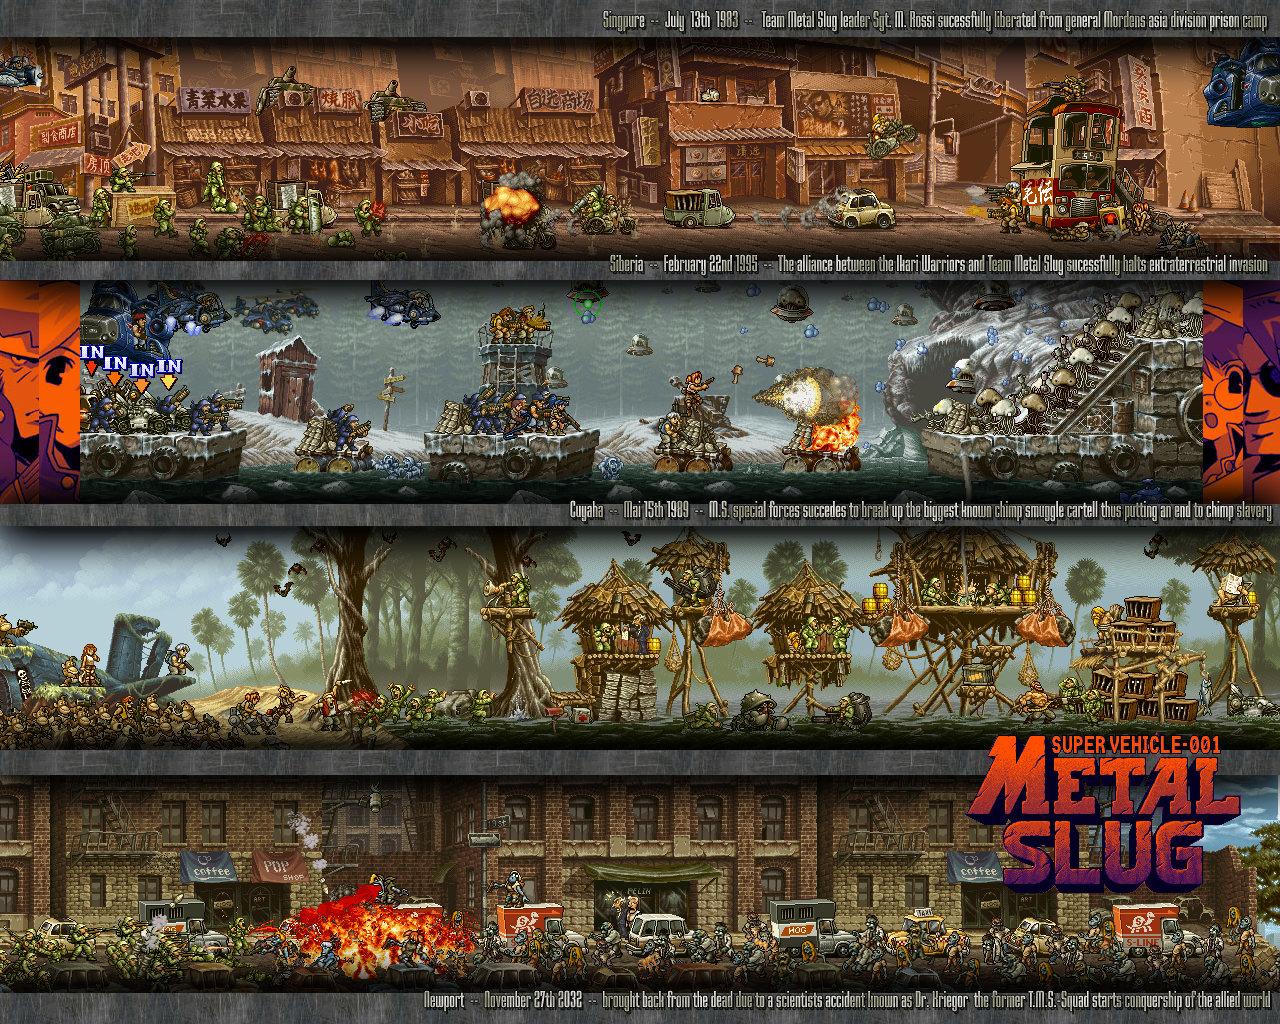 Metal Slug Wallpapers Hd For Desktop Backgrounds